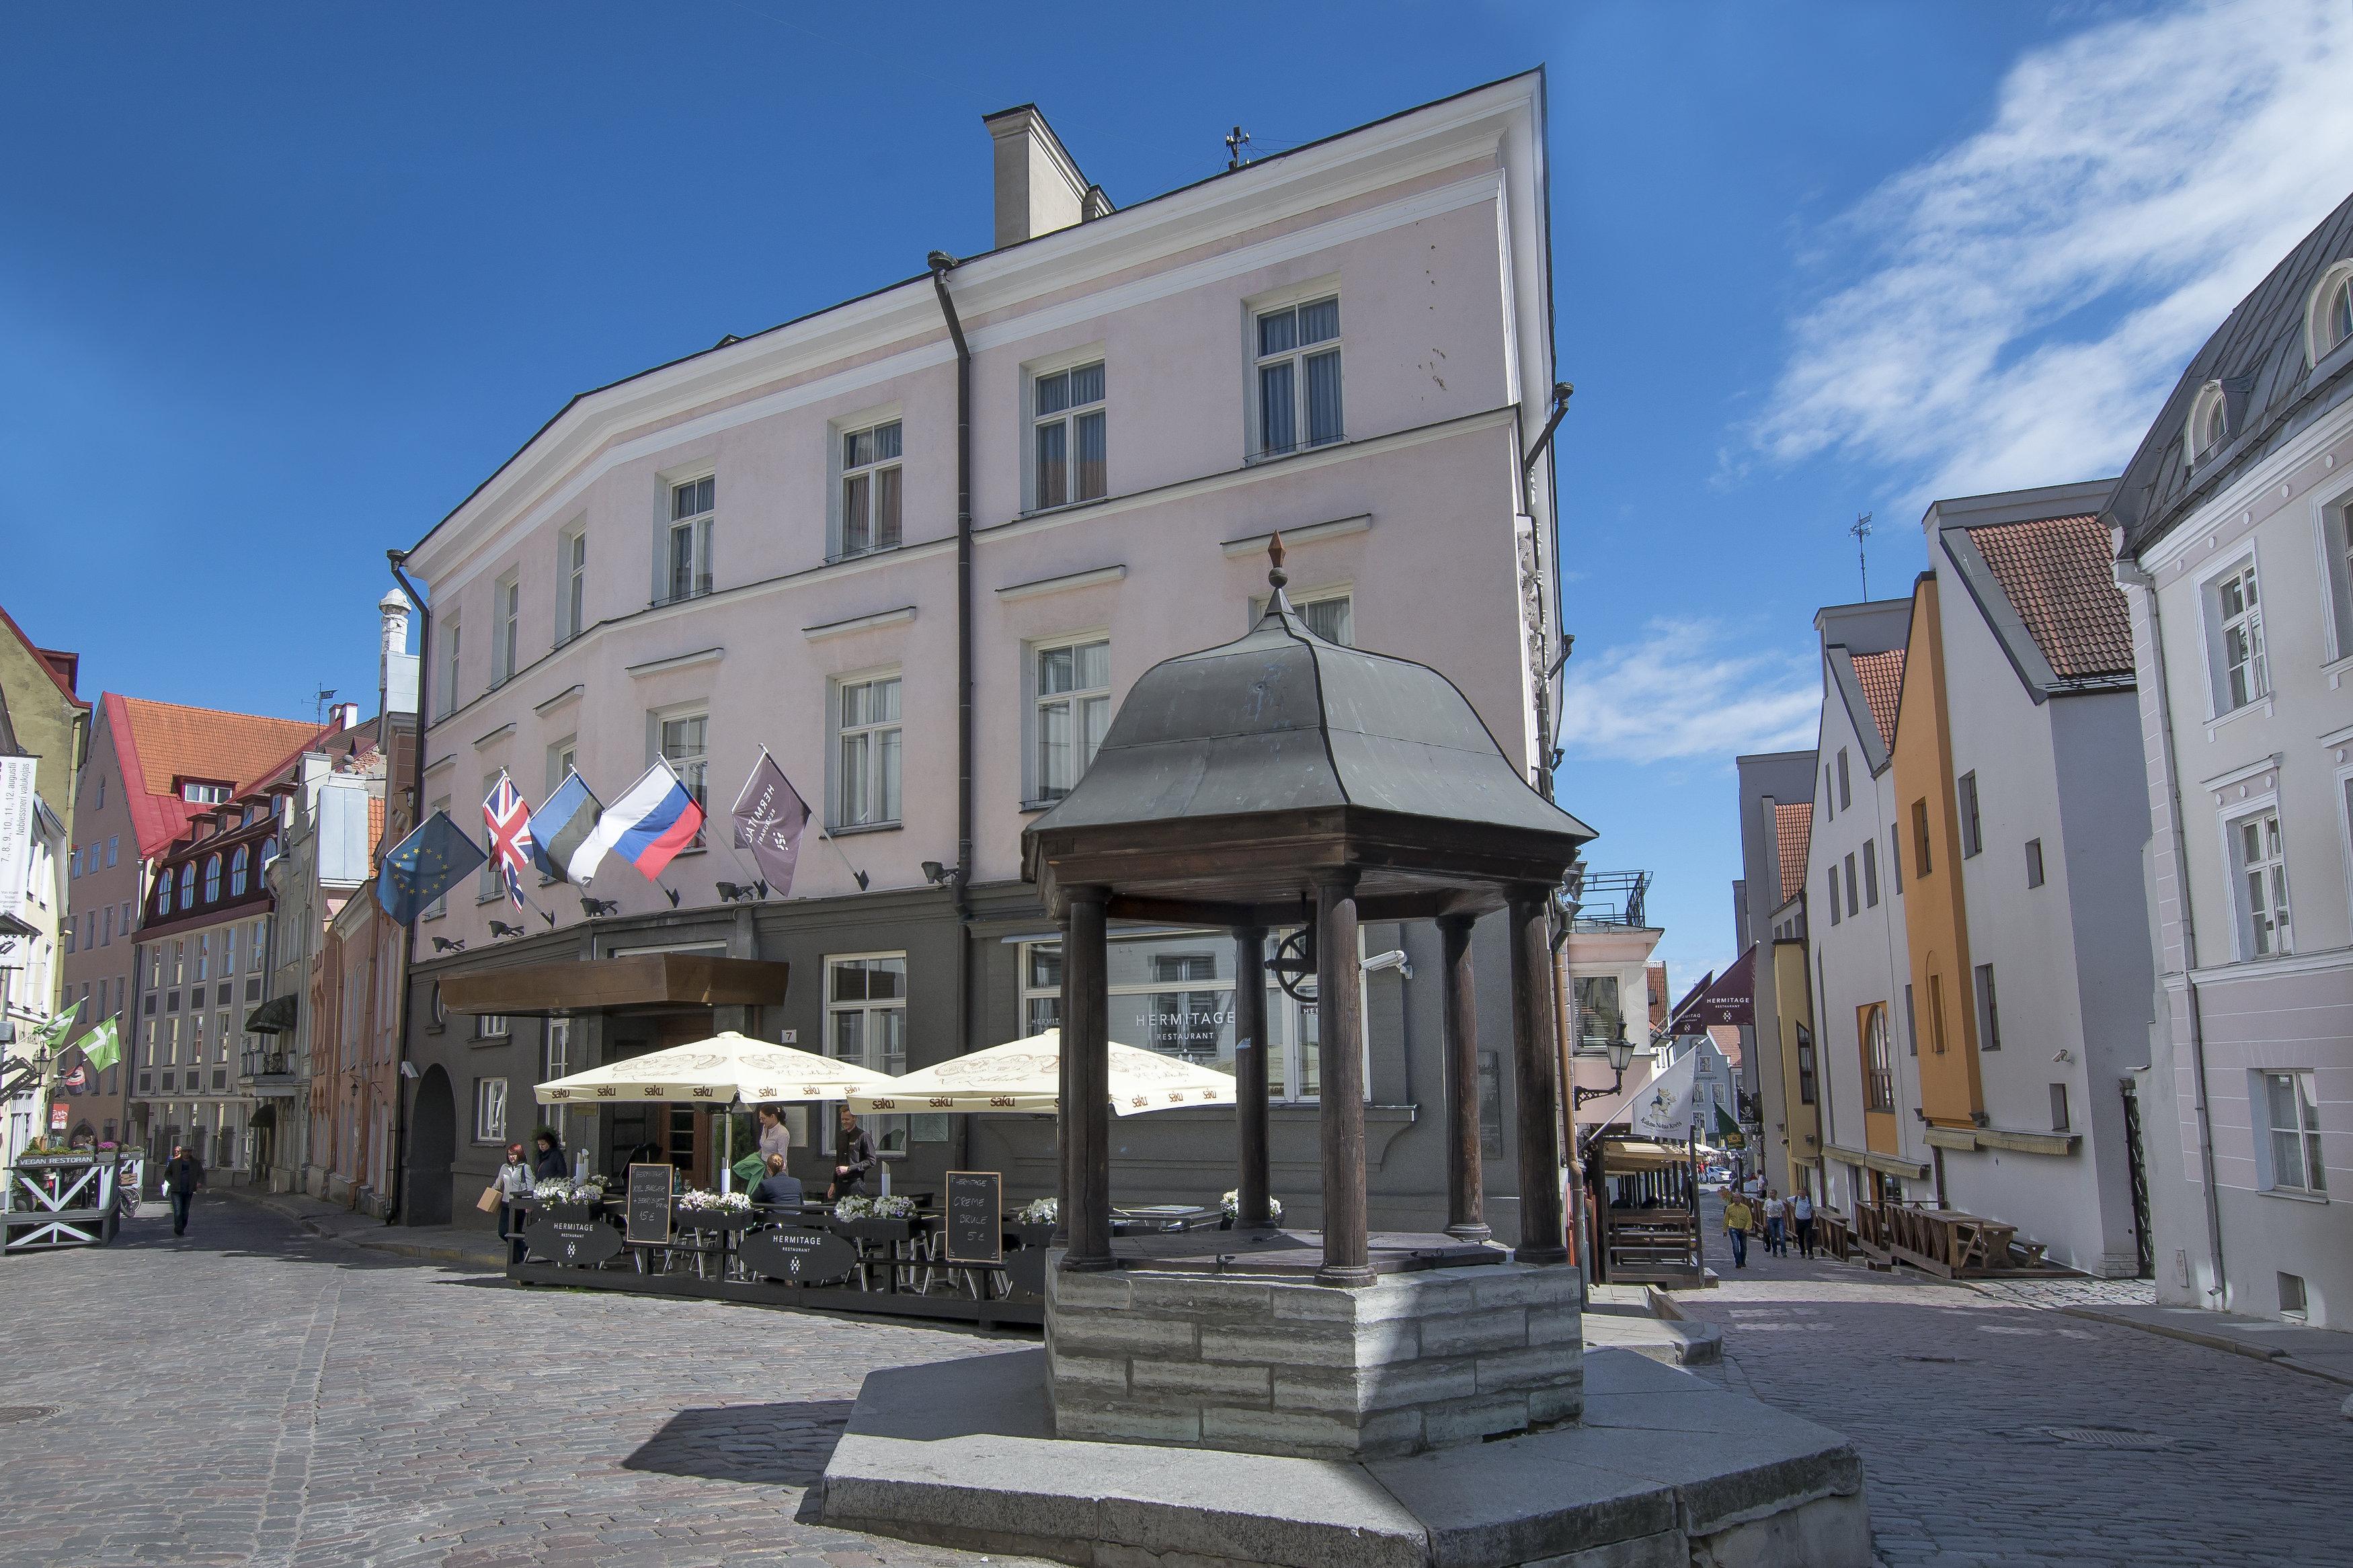 St Petersbourg, Tallinn